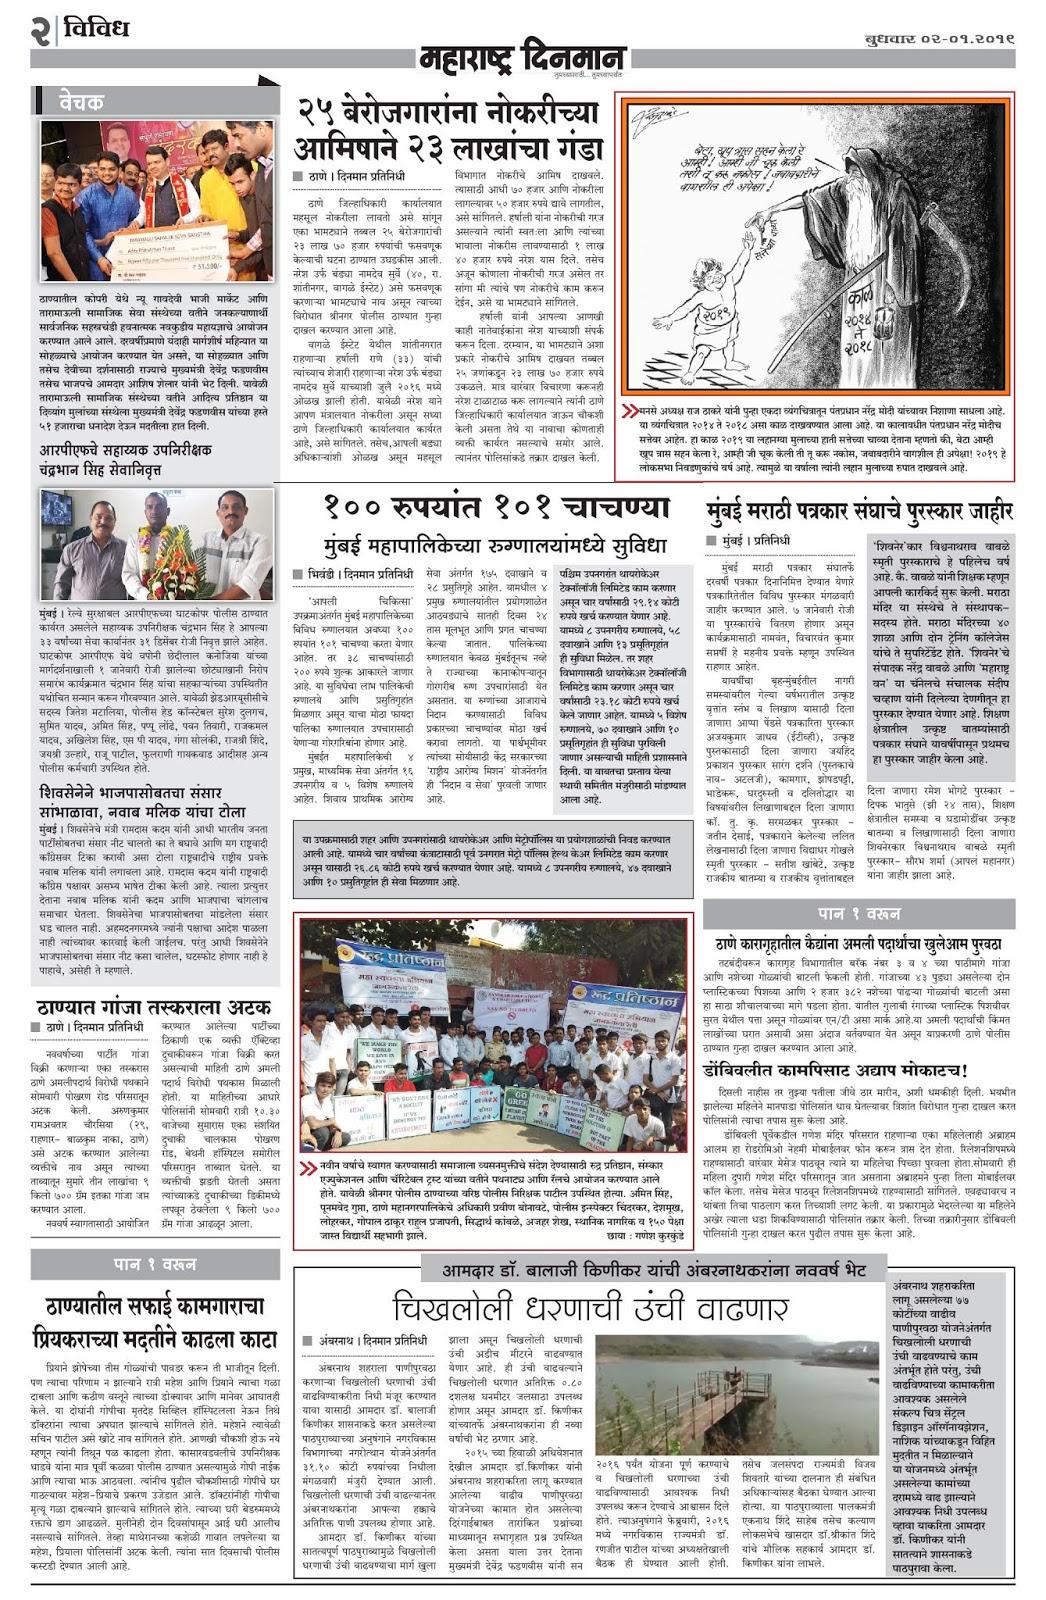 Thane Marathi Daily Newspaper Maharashtra Dinman 02-01-2019, Page 2